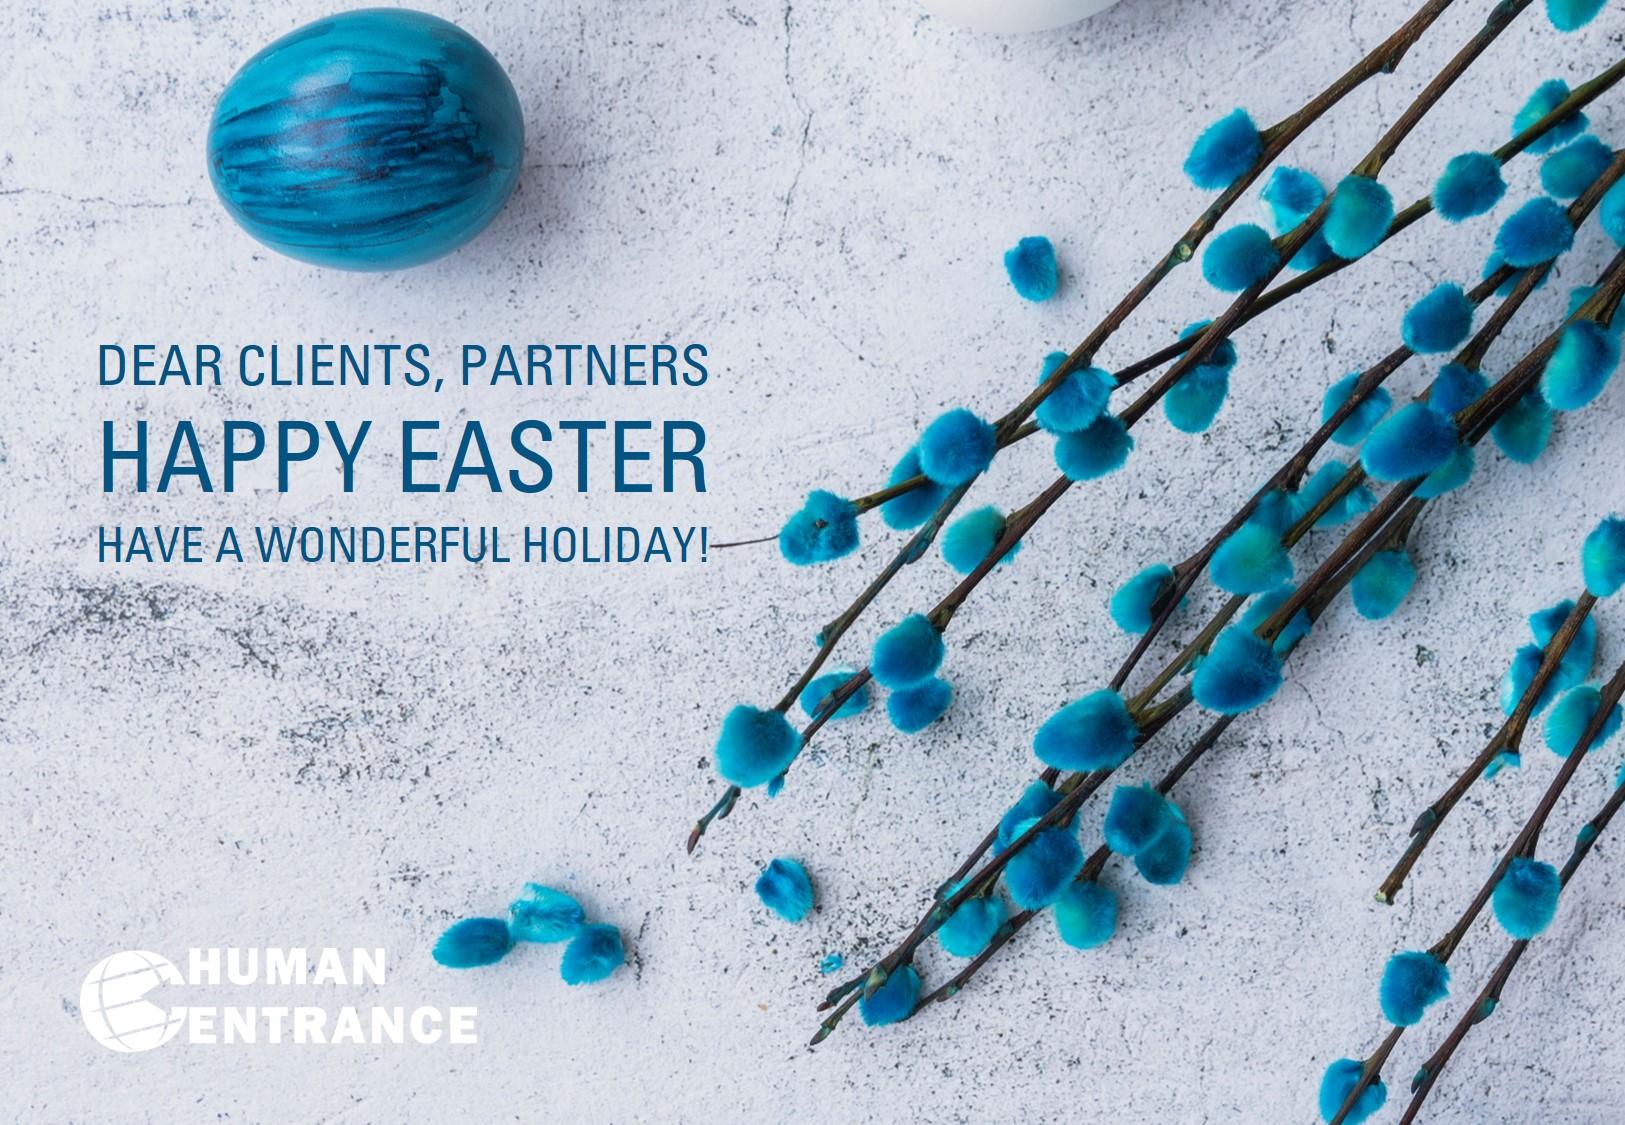 Human Entrance Easter seasonal greeting